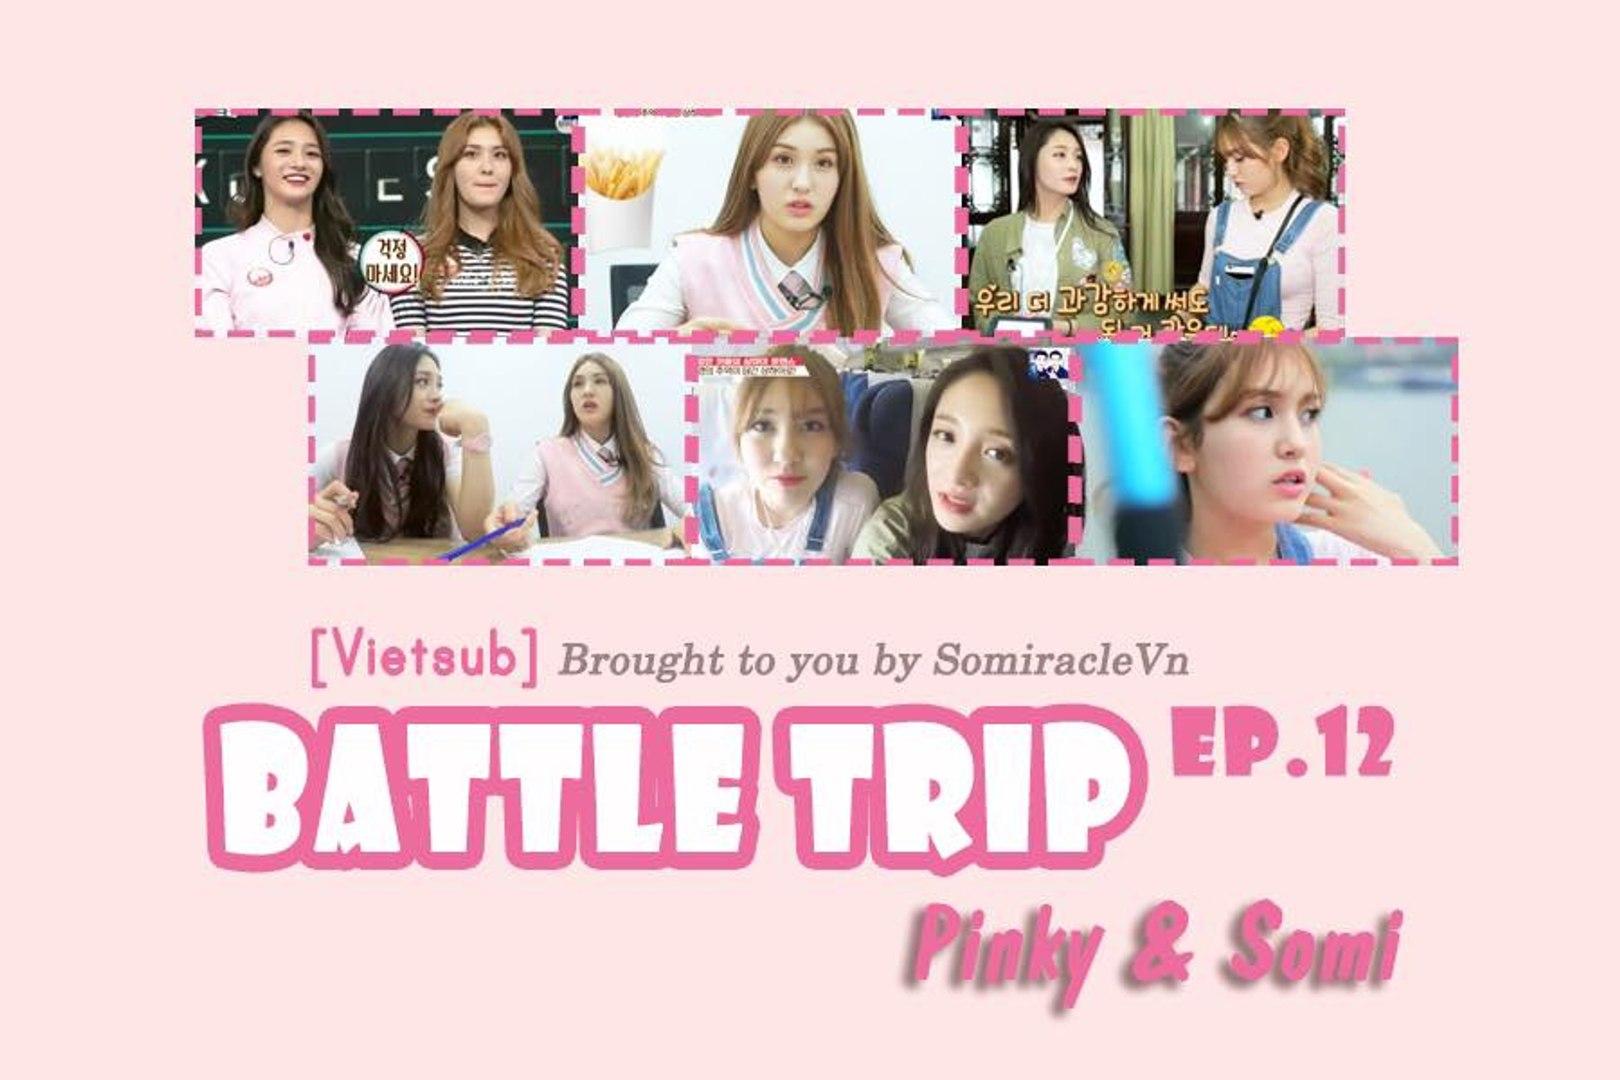 [Vietsub] Battle Trip - Ep.12 Part 1/4 Pinky & Somi